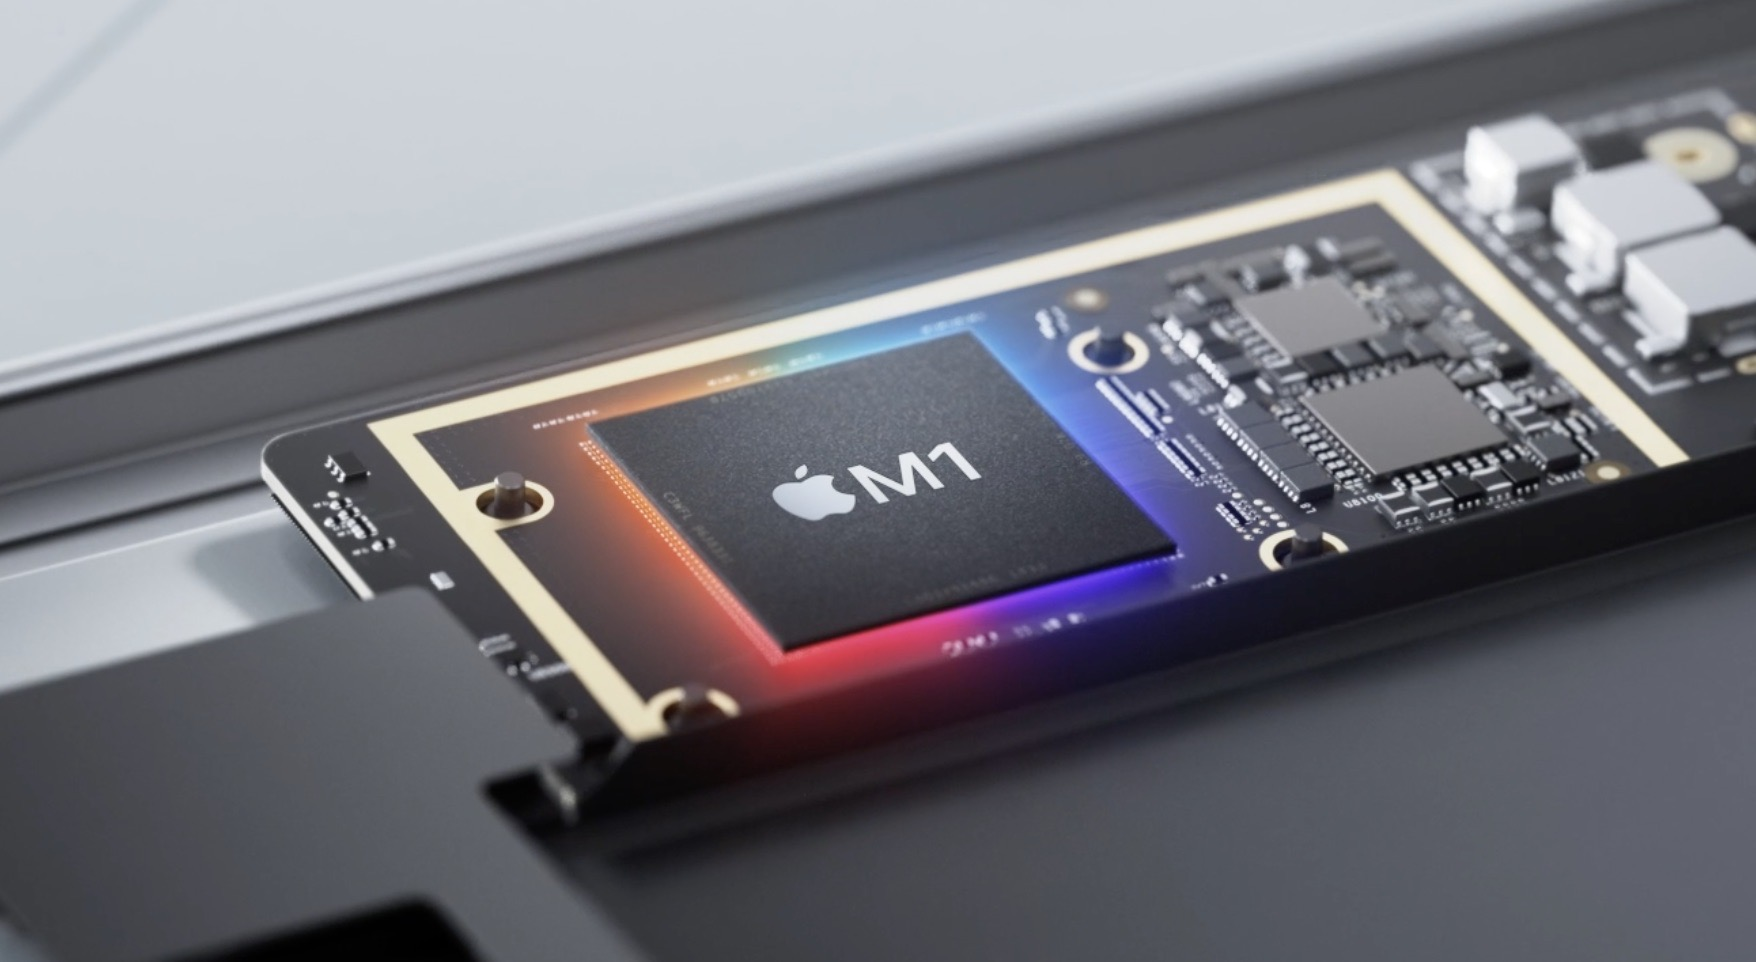 M1 MacBook Air vs Pro image of M1 chip